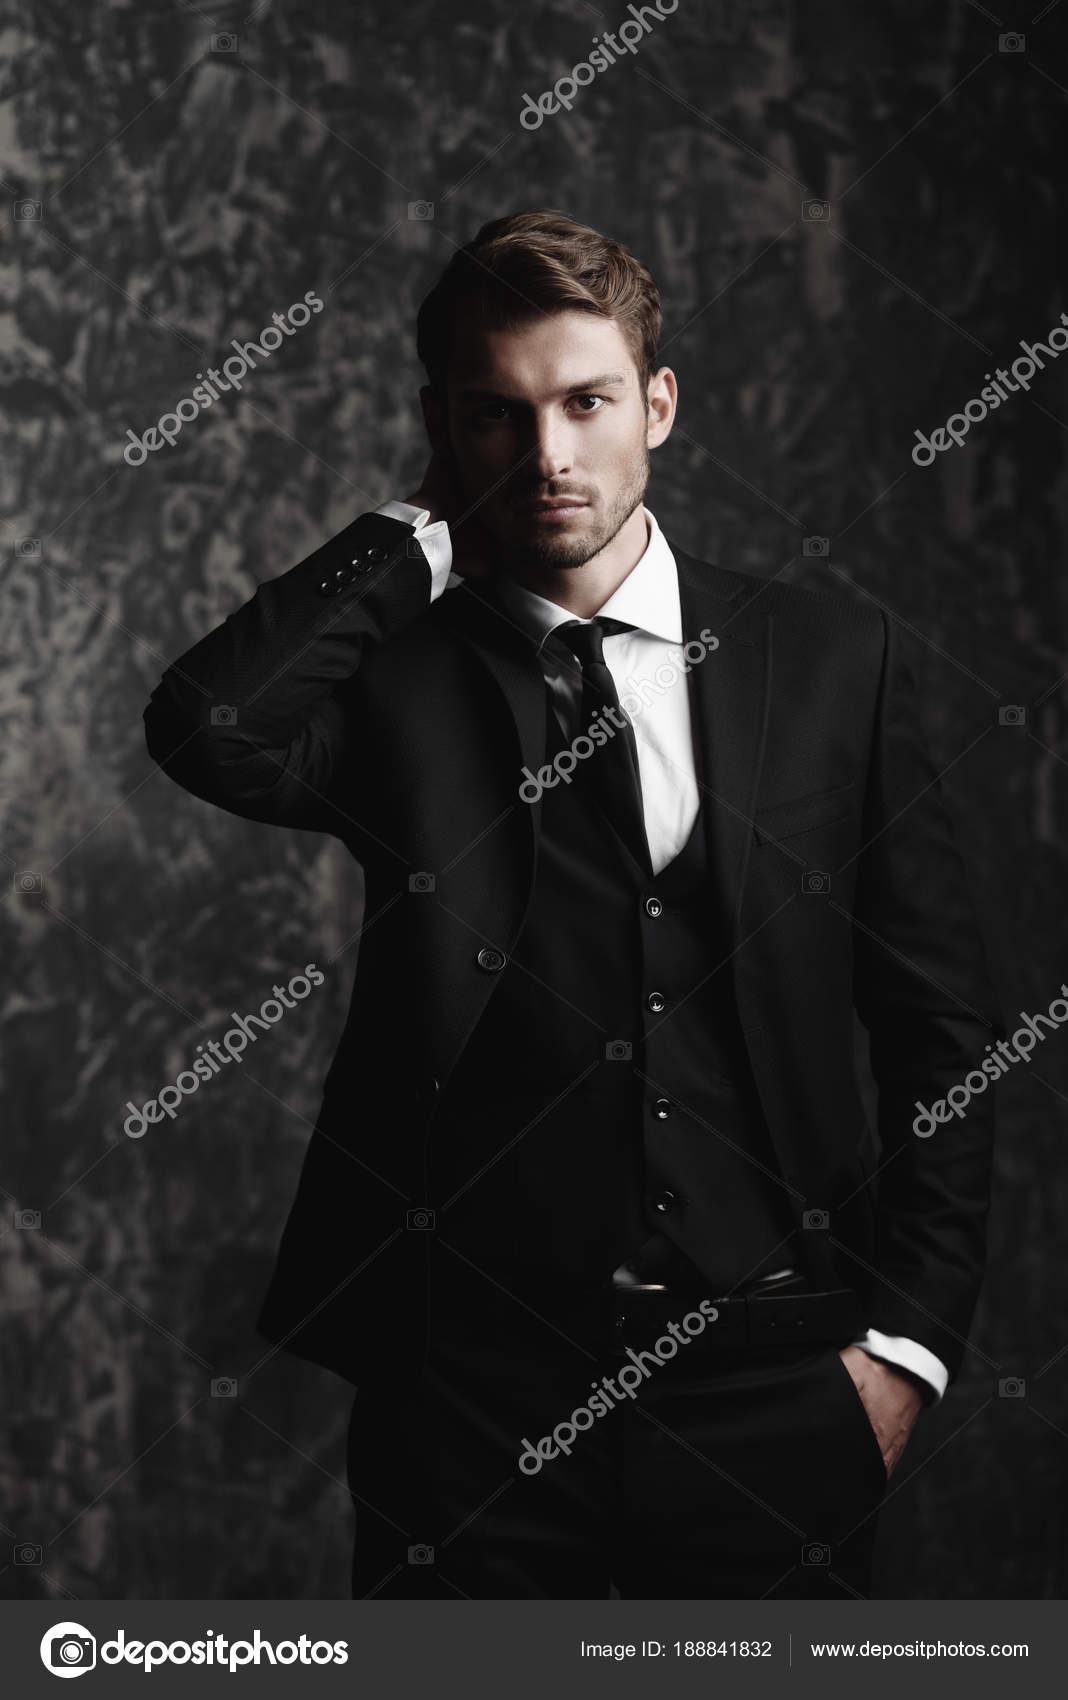 bdf57a6020 Abito uomo elegante classico — Foto Stock © prometeus #188841832